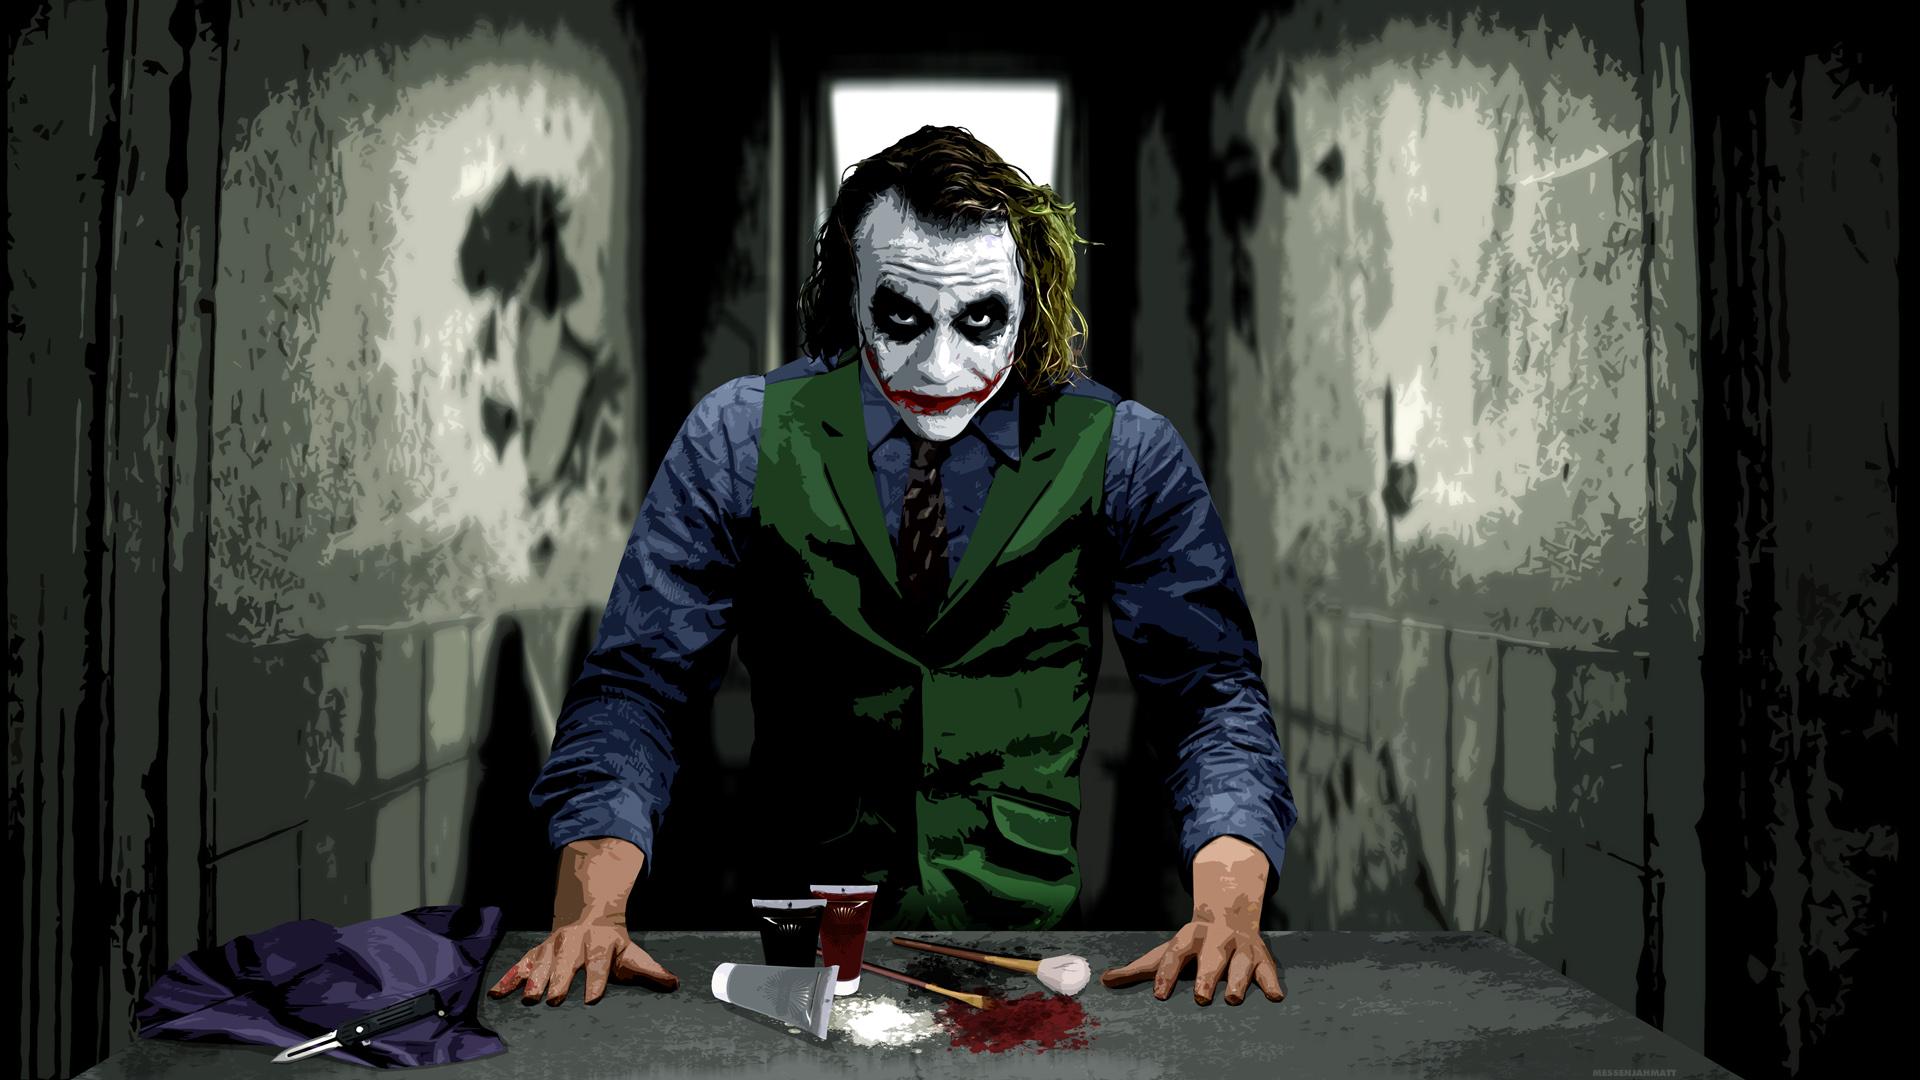 Wallpaper download joker - Wallpaper Download Joker 1